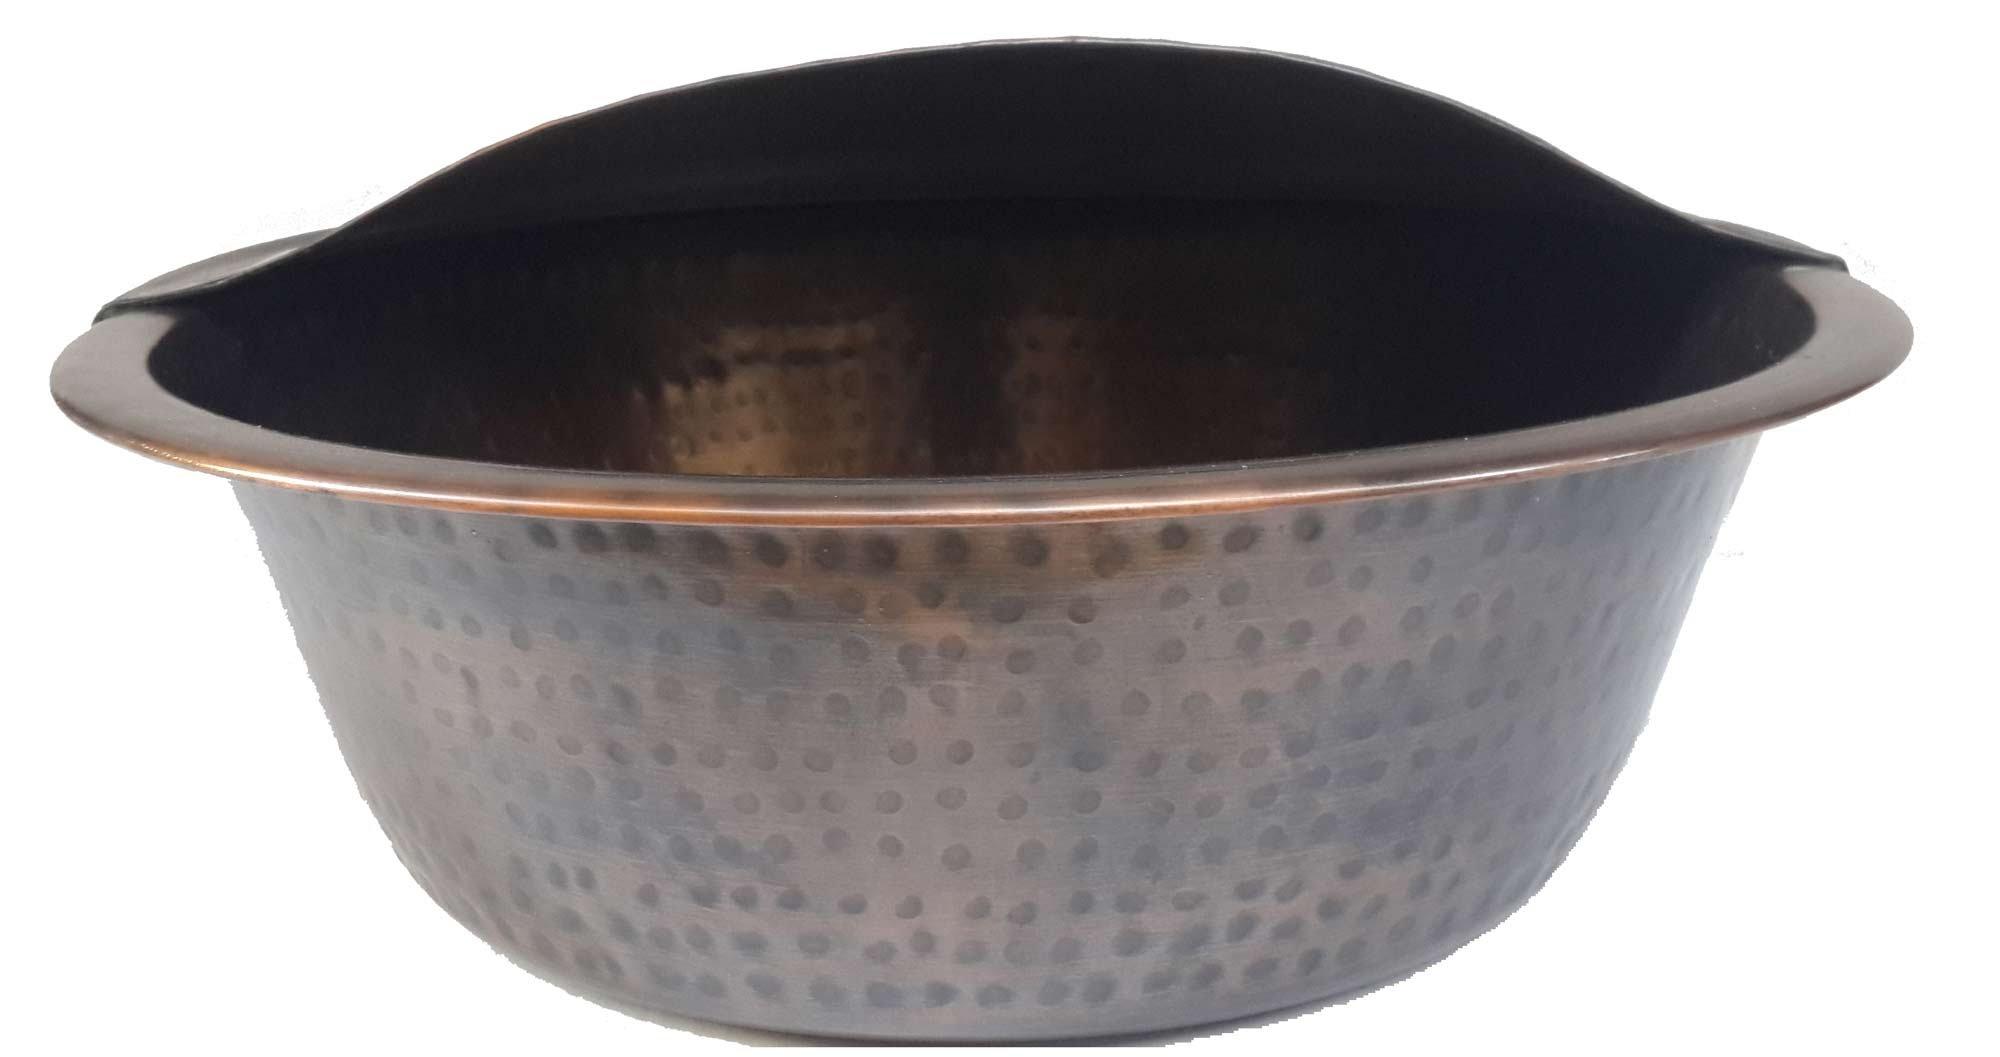 Egypt gift shops Foot Bath Wash Pedicure Spa Massage Antique Patina Handmade Bowl